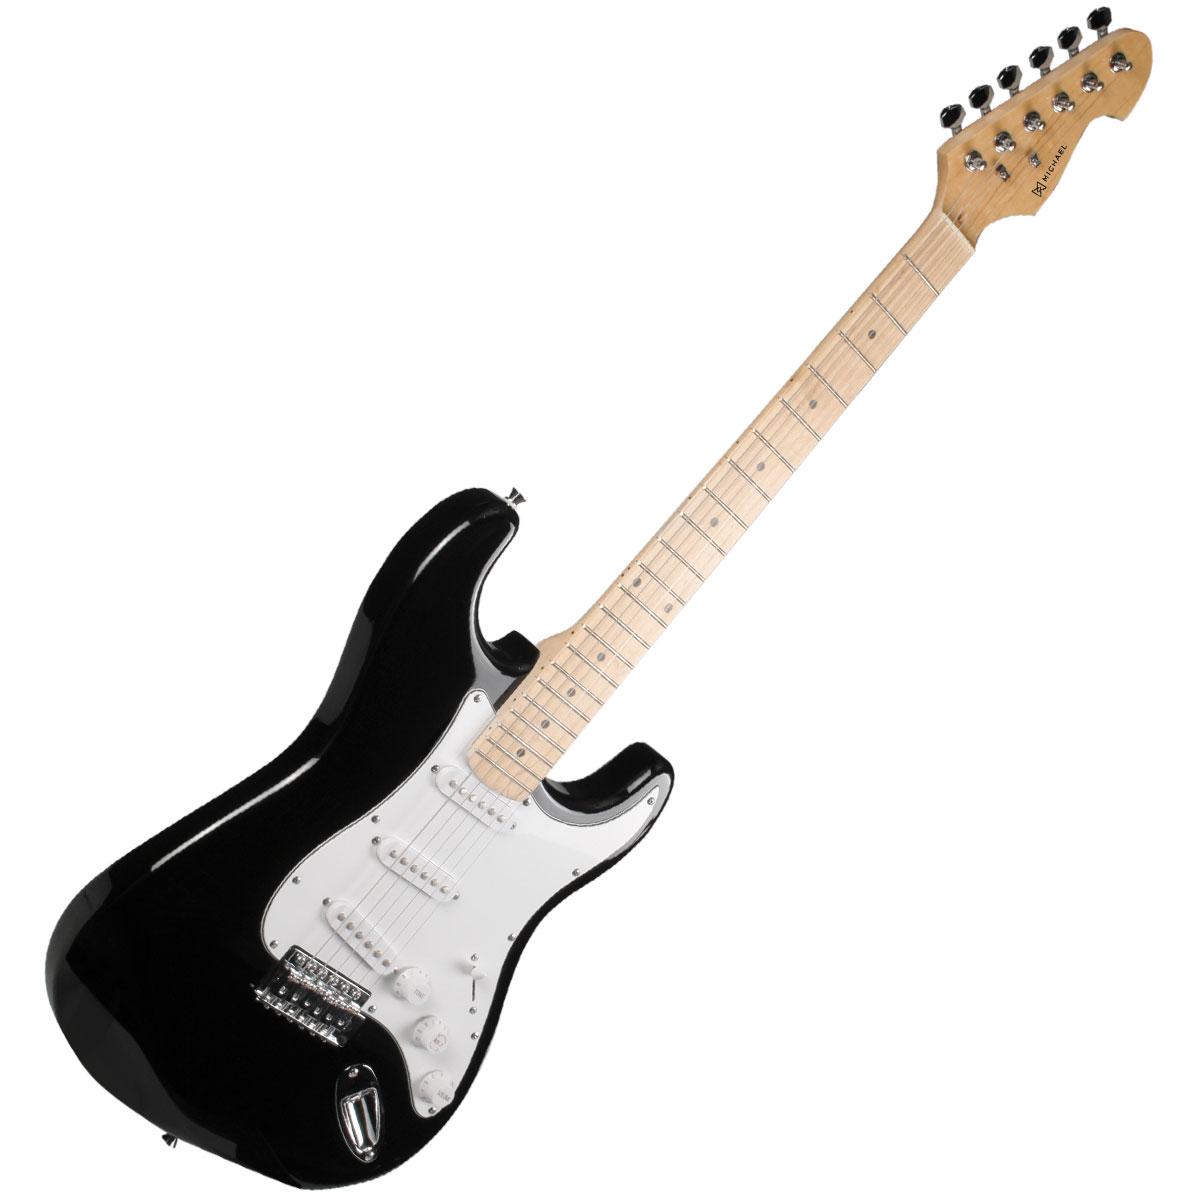 Guitarra Strato Advanced GM227 MBK Preta Metálica - Michael